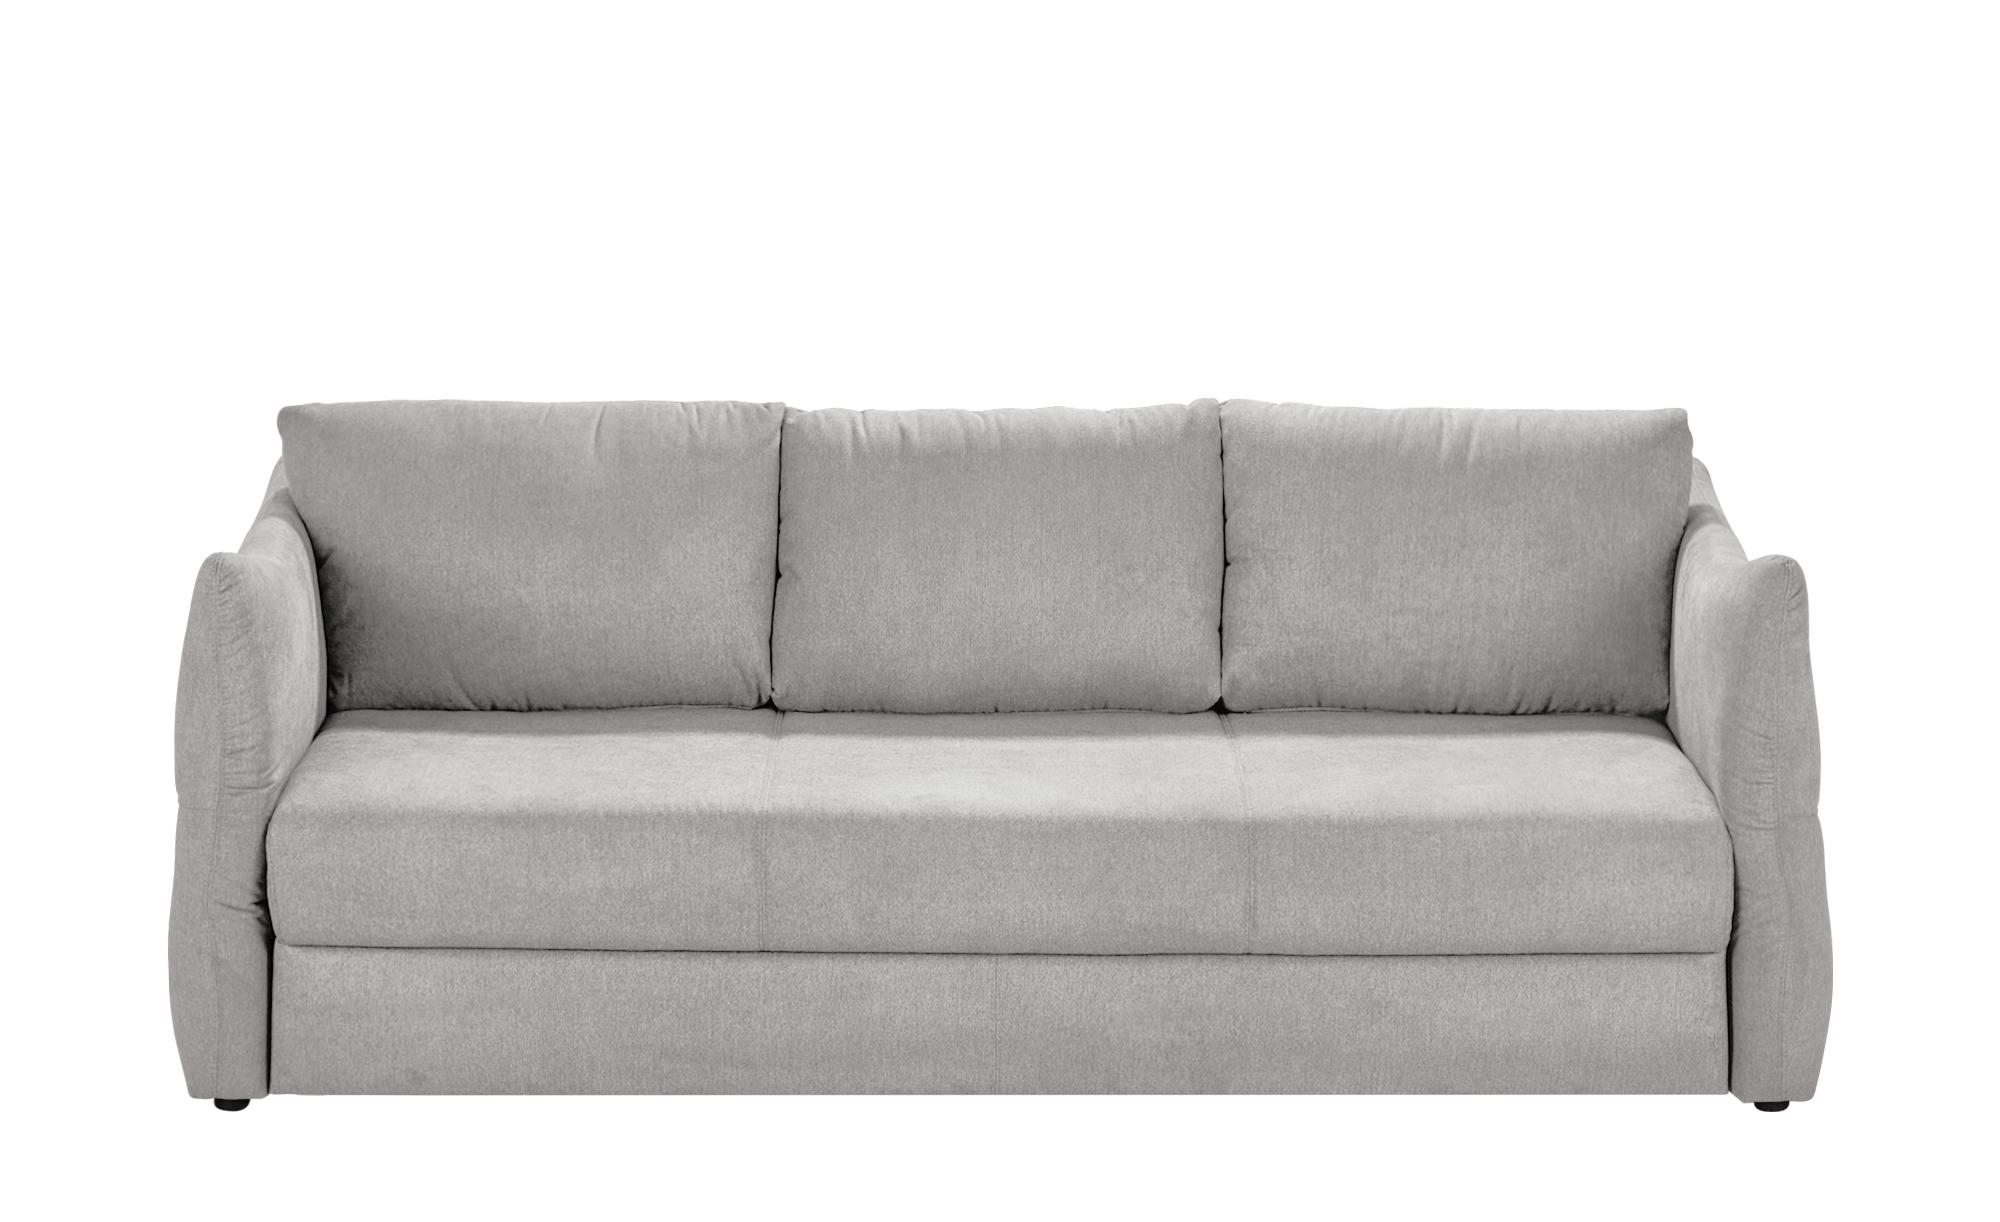 smart Sofa 3-sitzig hellgrau - Webstoff Franziska ¦ grau ¦ Maße (cm): B: 226 H: 100 T: 87 Polstermöbel > Sofas > 3-Sitzer - Höffner